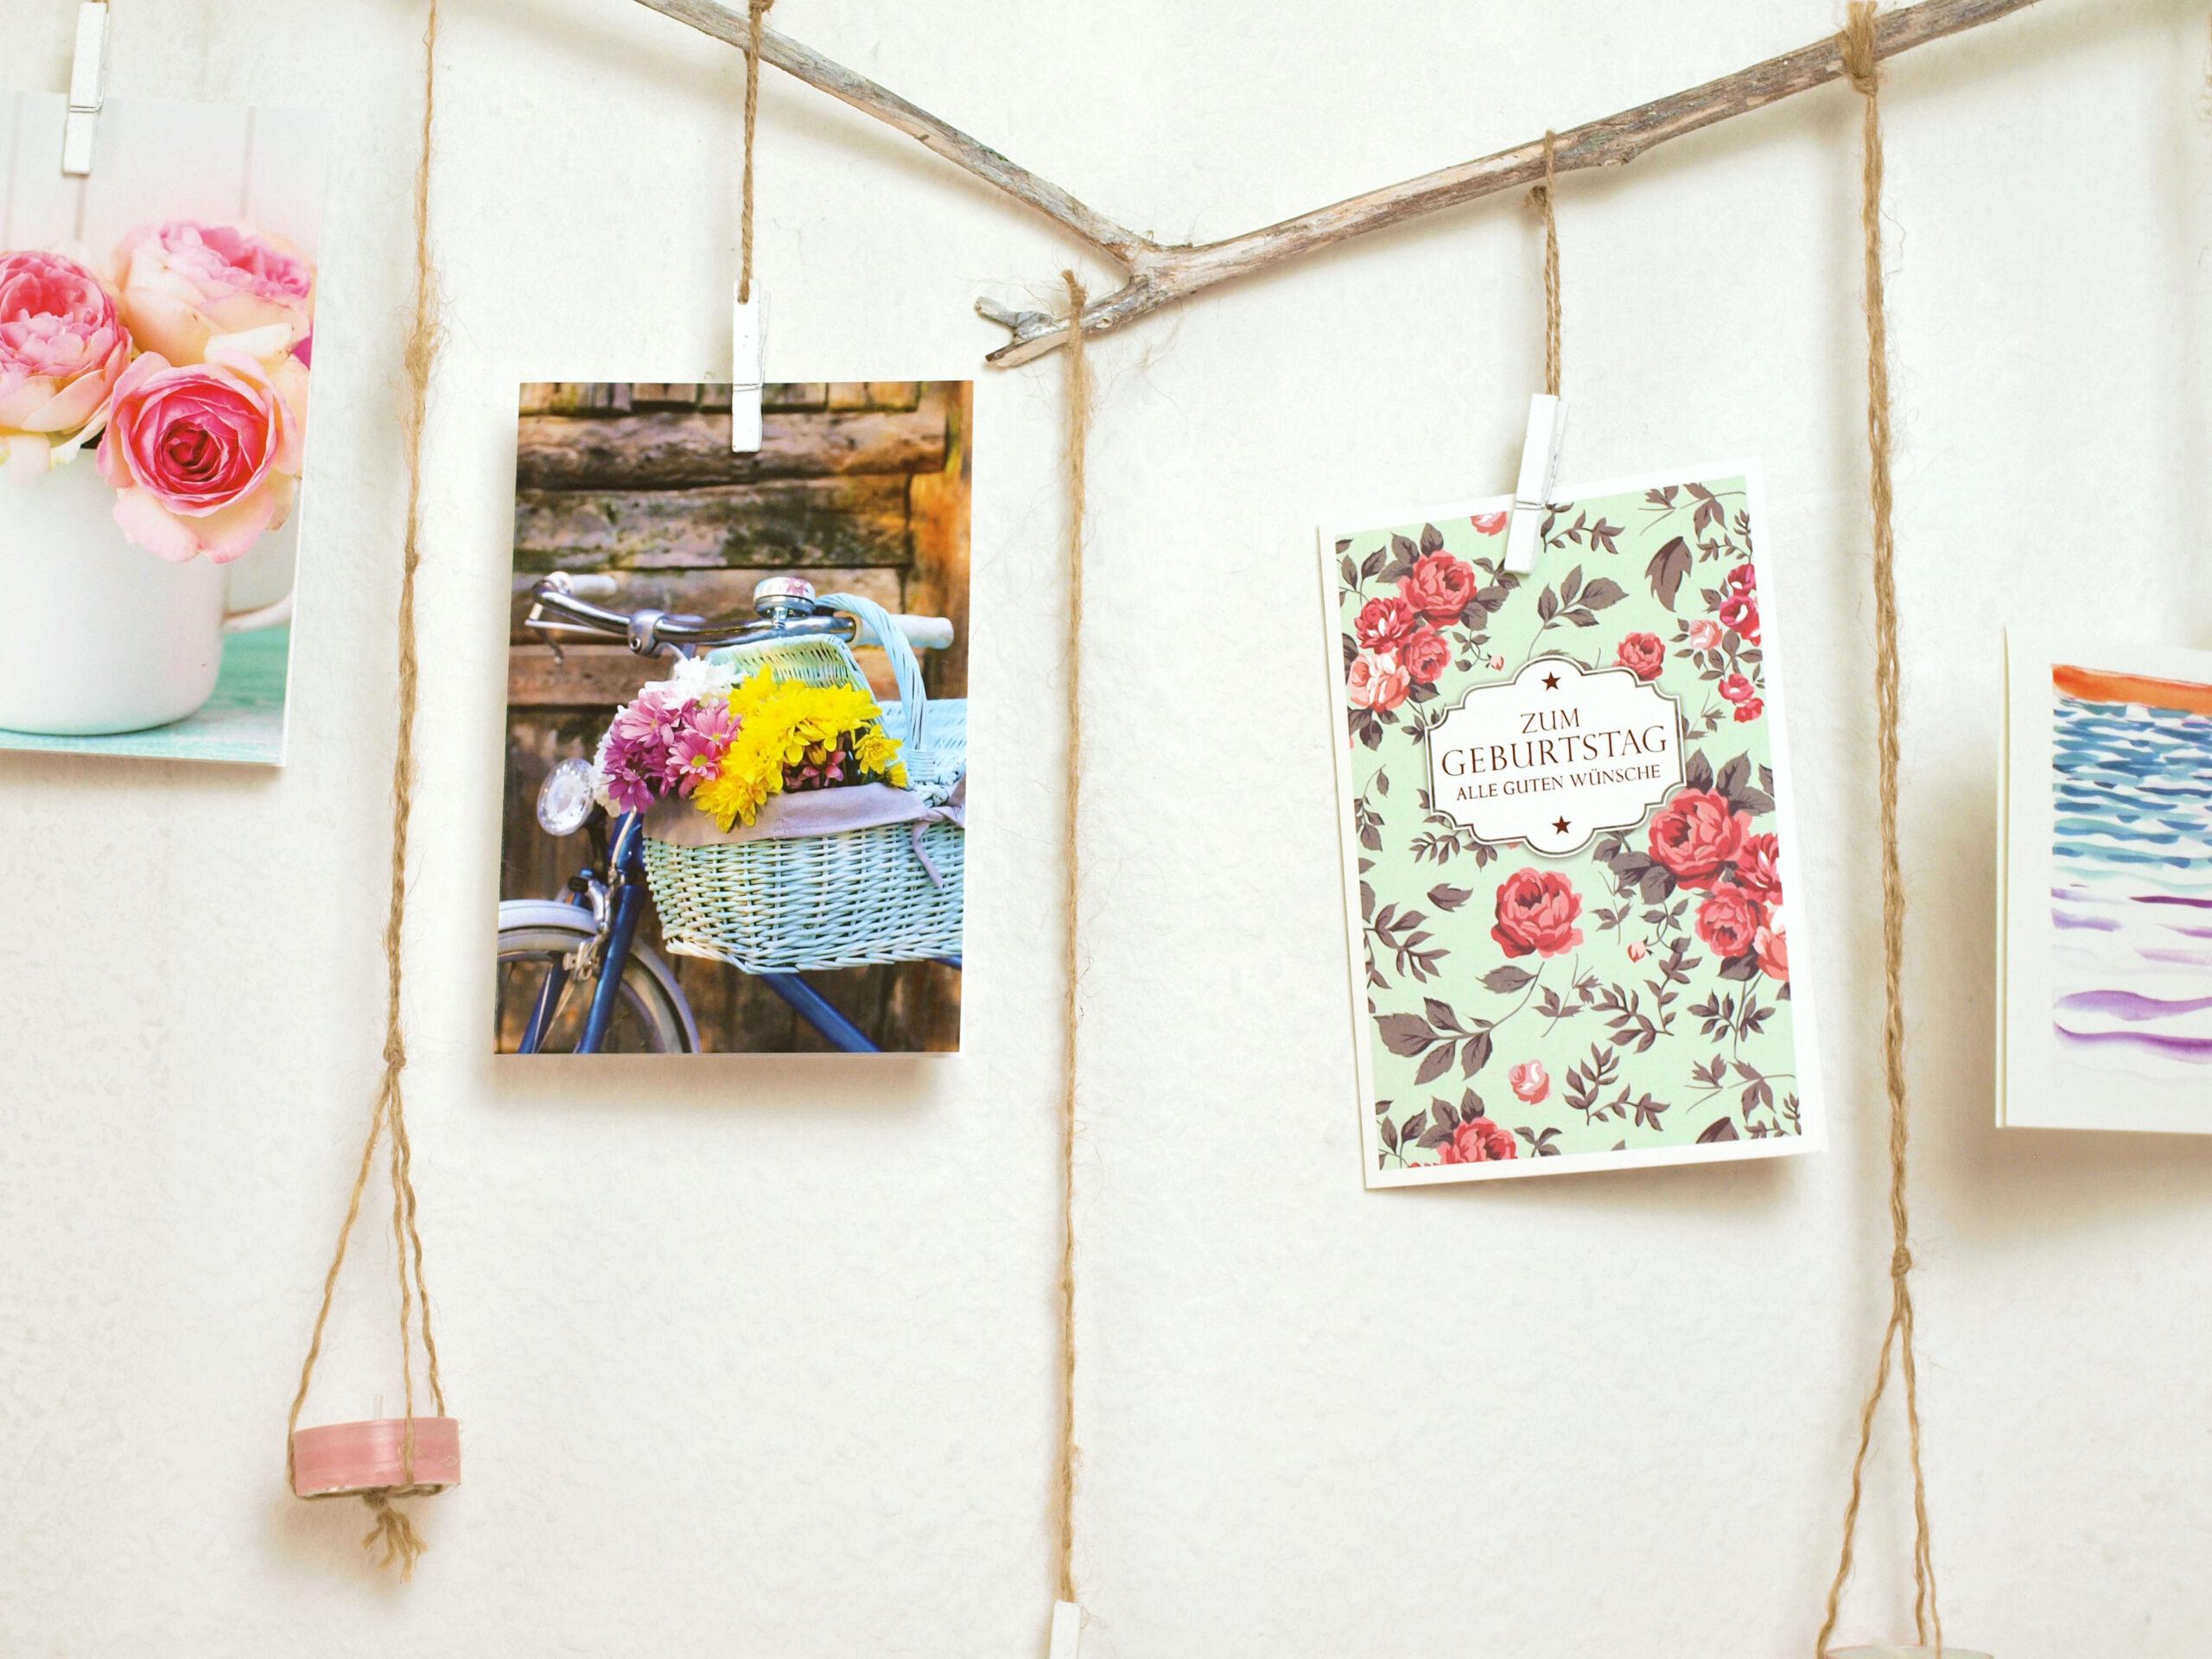 Diy deko ast frau liebling diy blog ber geschenke deko for Deko geschenke